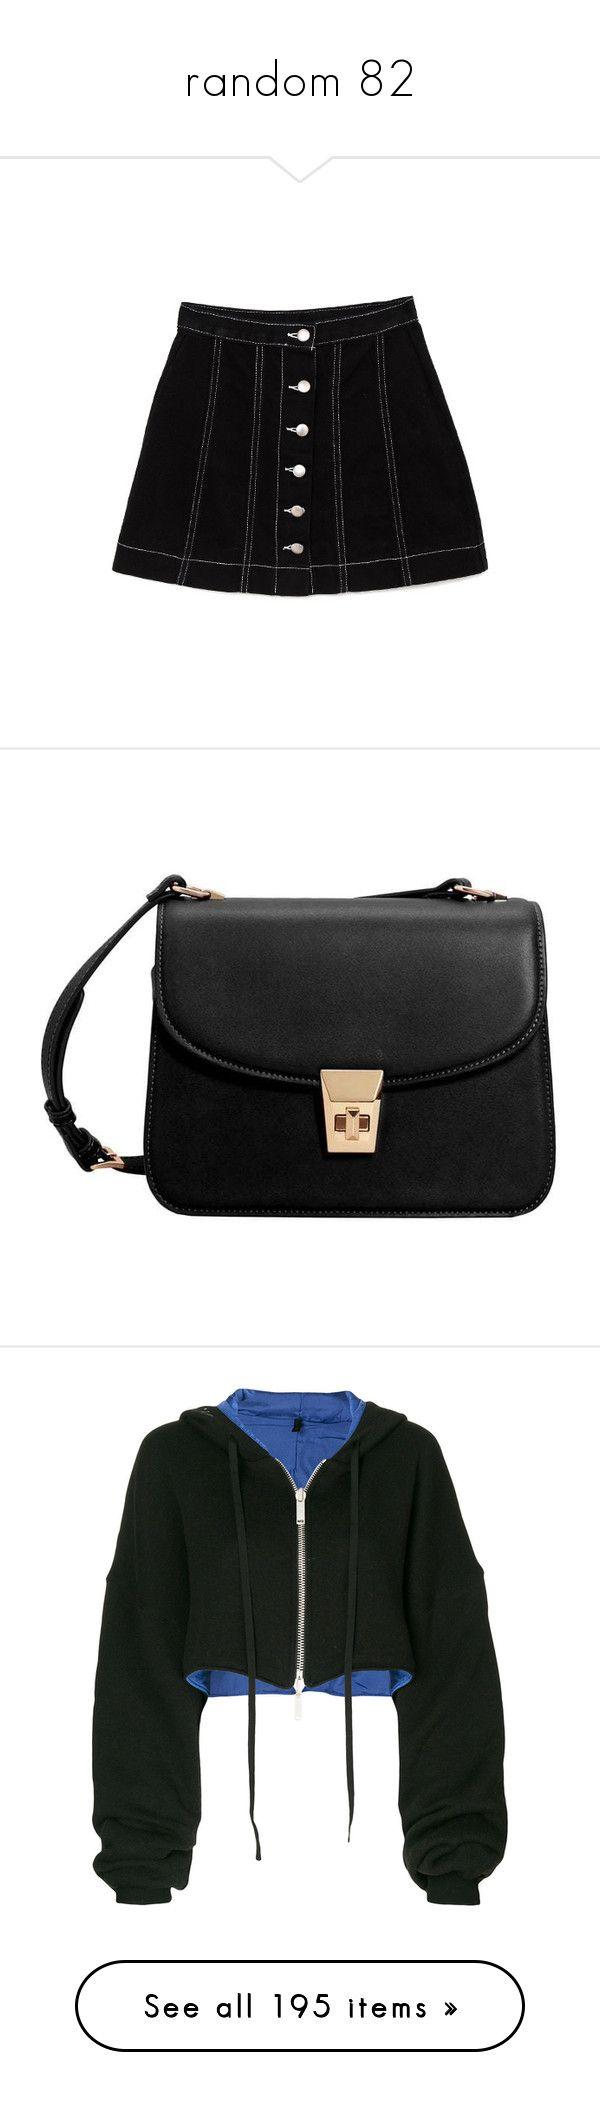 """random 82"" by noora-j ❤ liked on Polyvore featuring bags, handbags, shoulder bags, mango handbags, pebbled-leather purses, mango purse, cross over purse, crossbody shoulder bag, tops and hoodies"